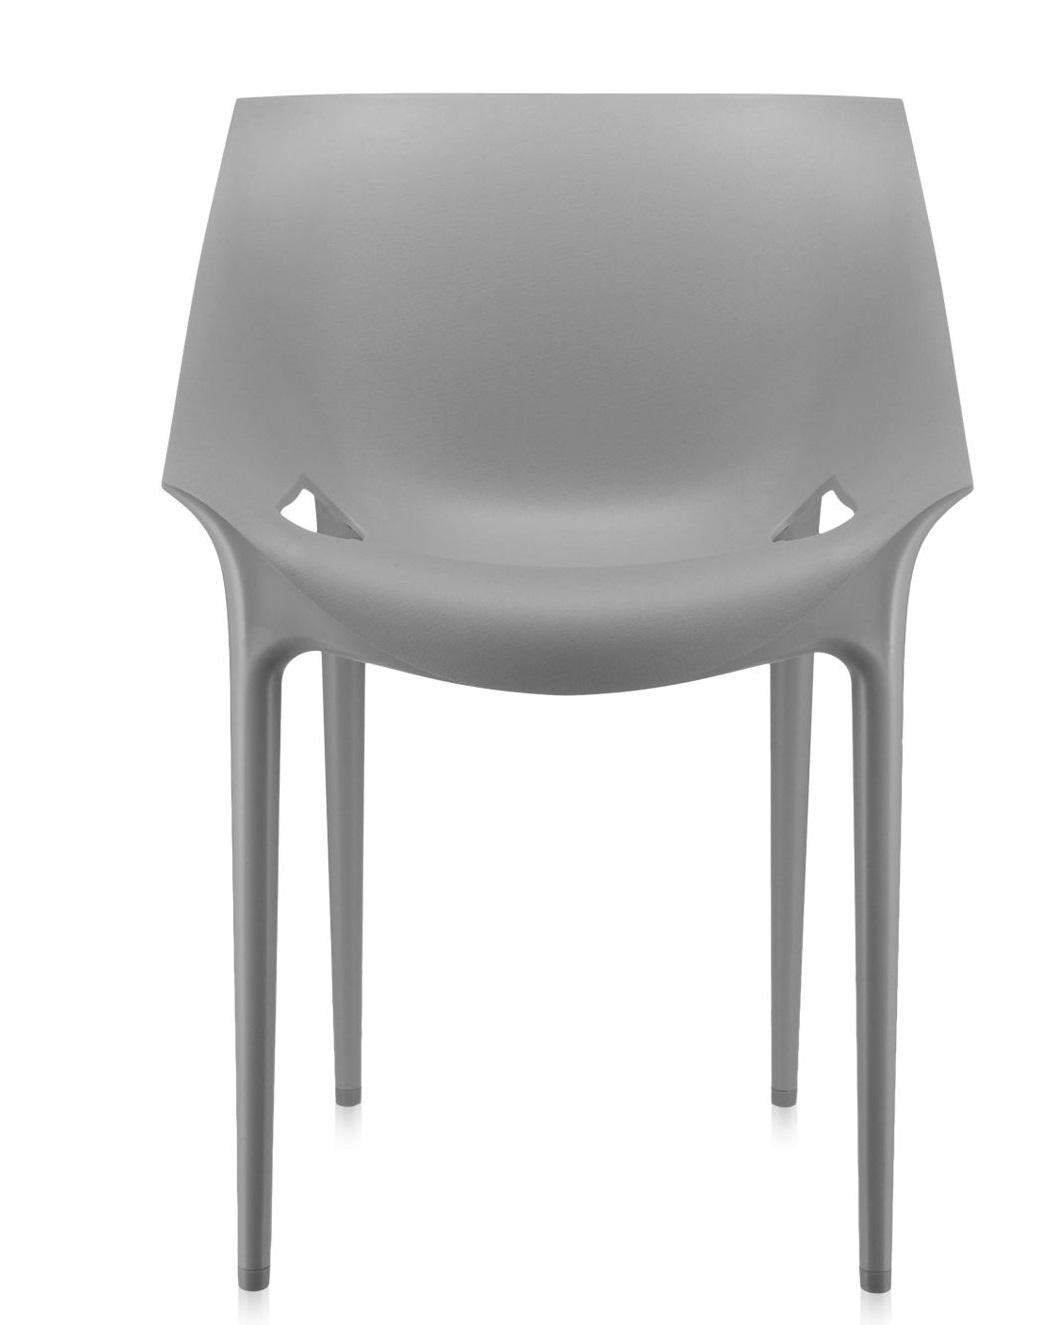 Scaun Kartell Dr. Yes design Philippe Starck & Eugeni Quitllet gri poza